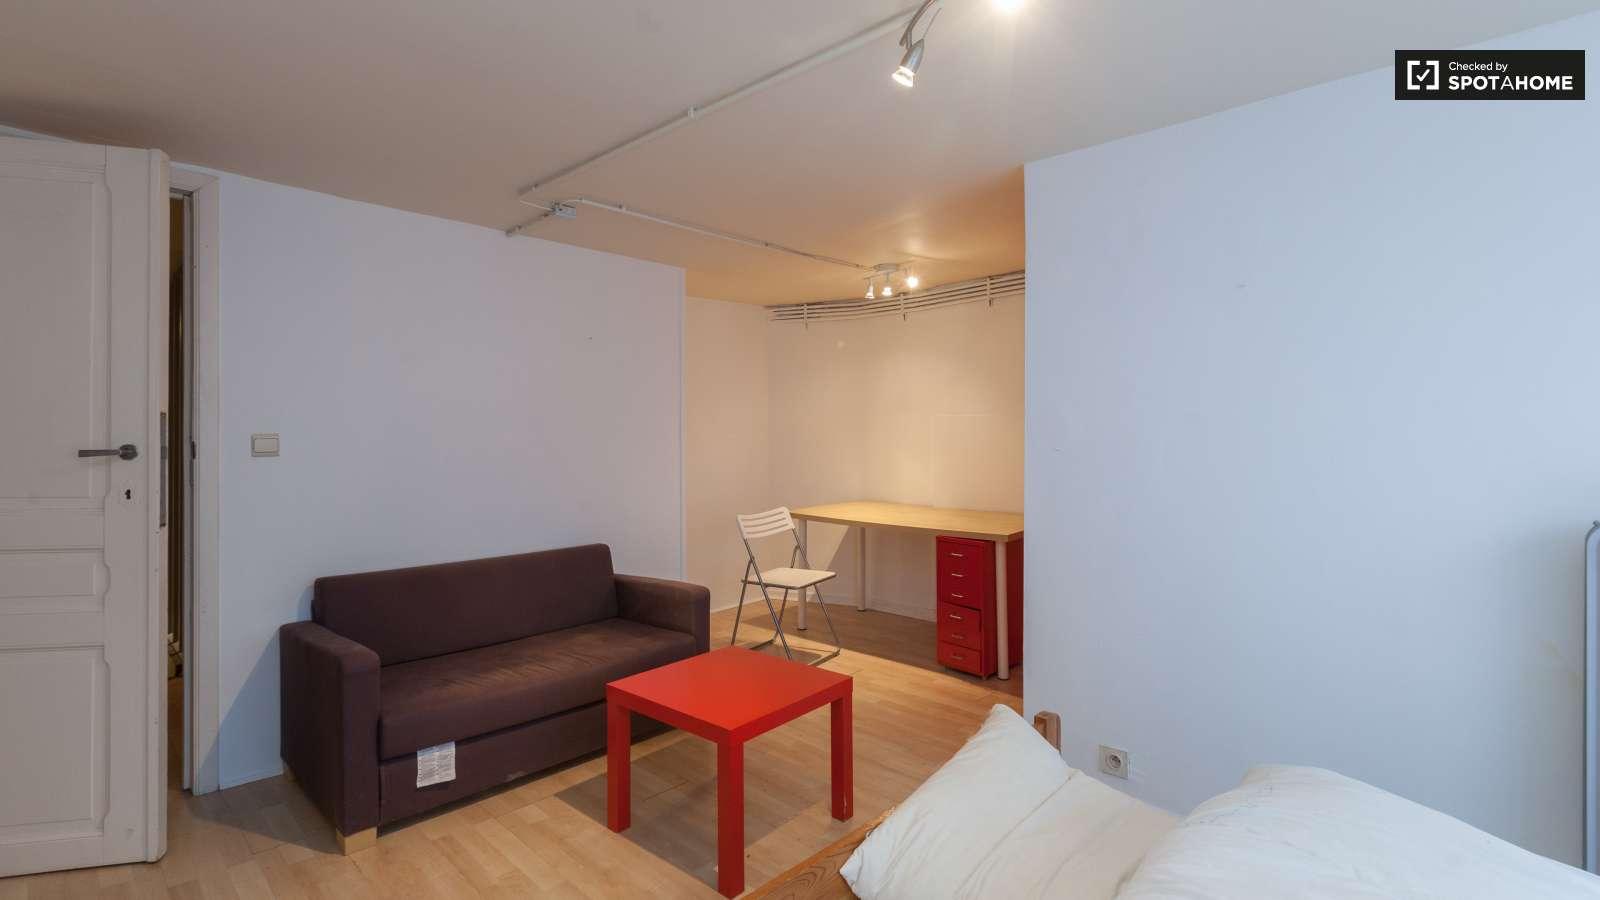 chambre privative dans un appartement de 3 chambres ixelles bruxelles ref 105221 spotahome. Black Bedroom Furniture Sets. Home Design Ideas